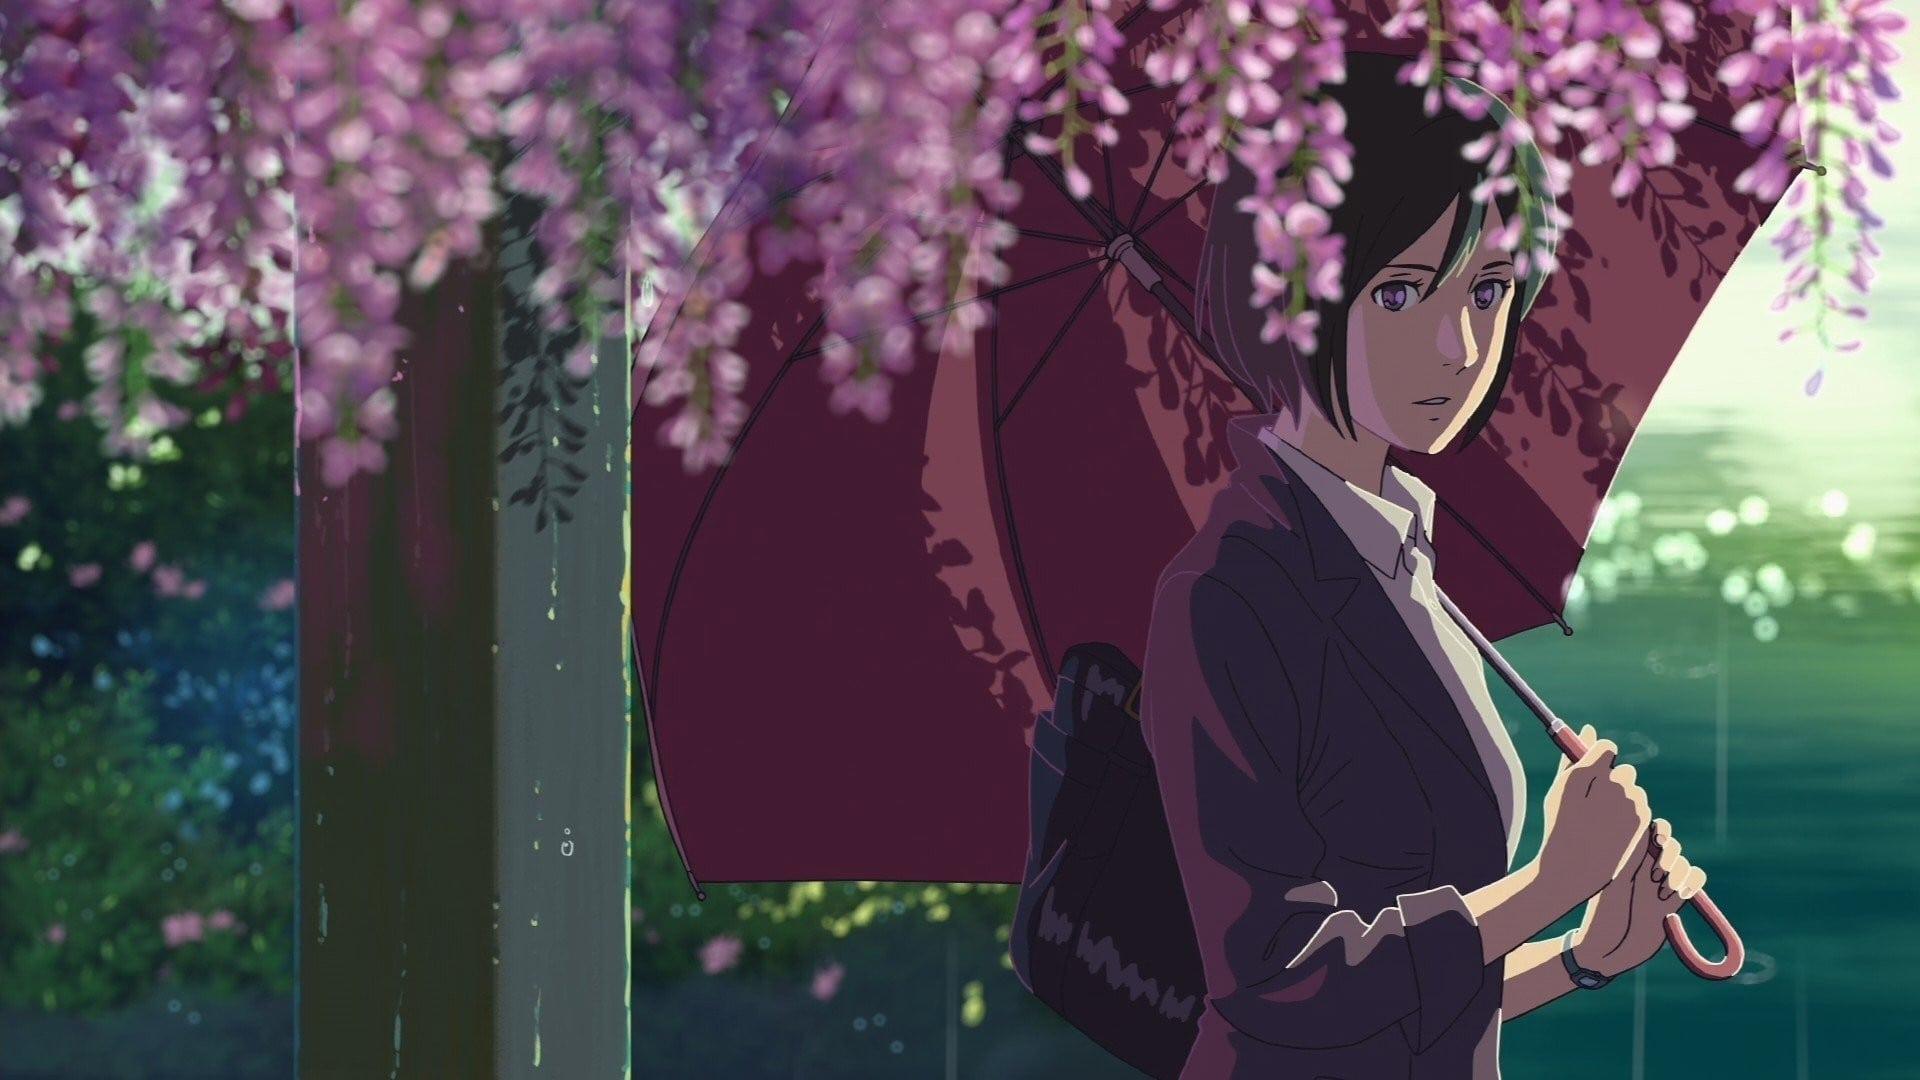 言叶之庭 言の葉の庭 (2013) 中文字幕